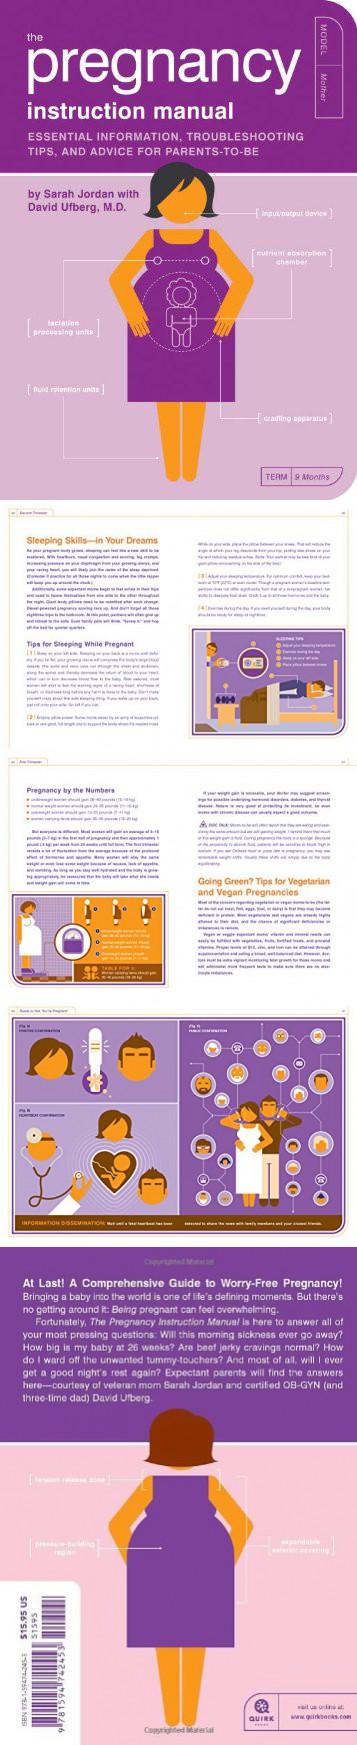 pregnancy instruction manual